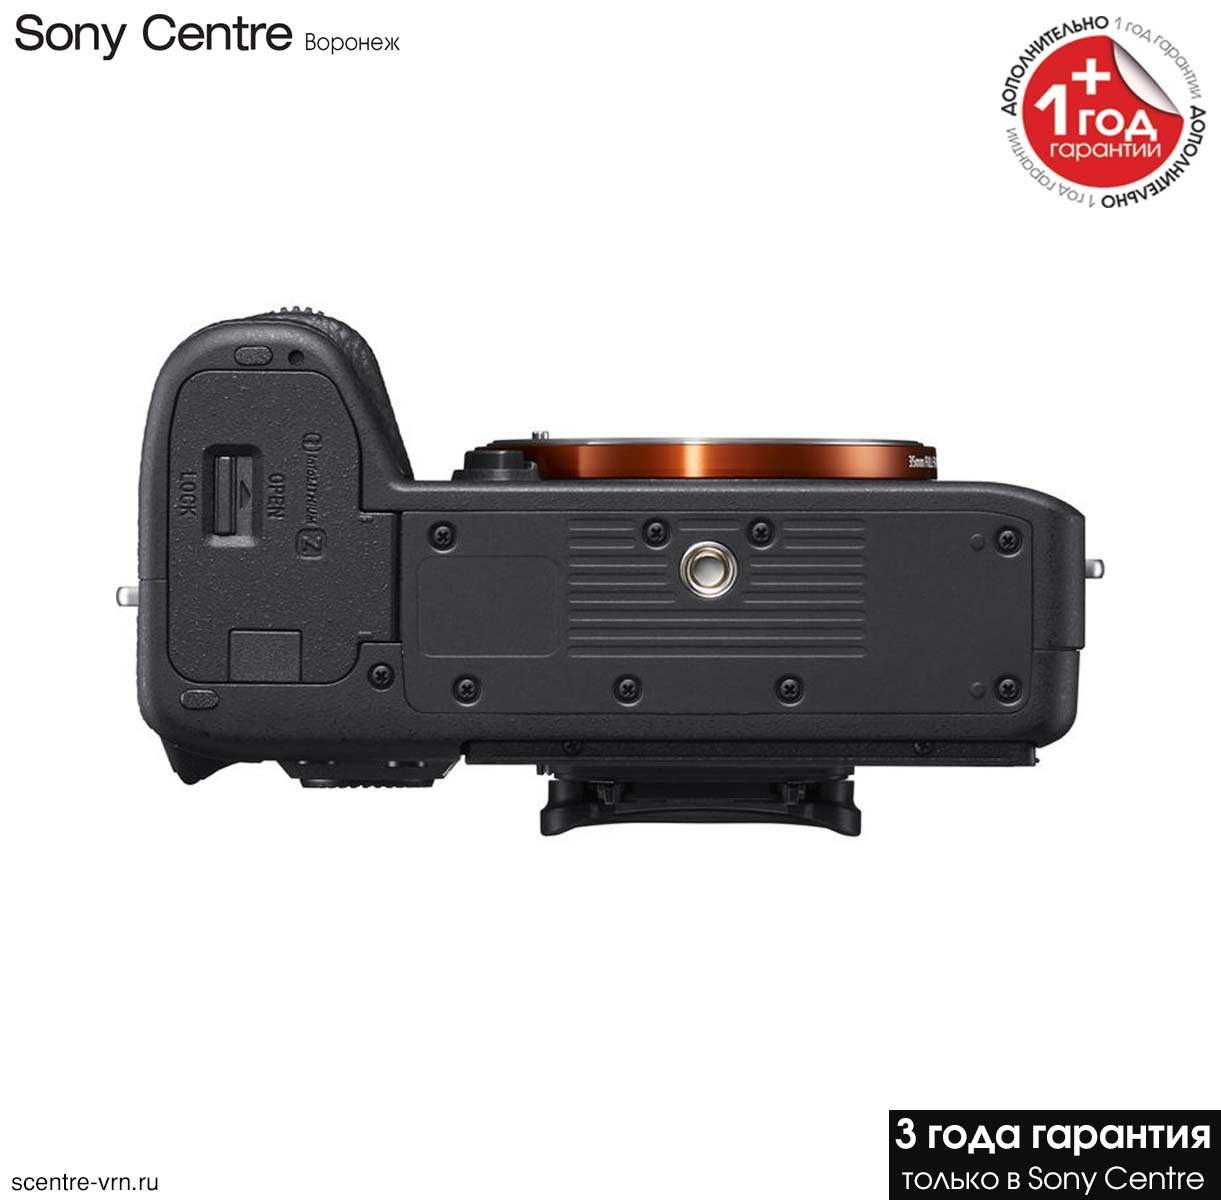 Фотоаппарат Sony Alpha ILCE-7R3 Body